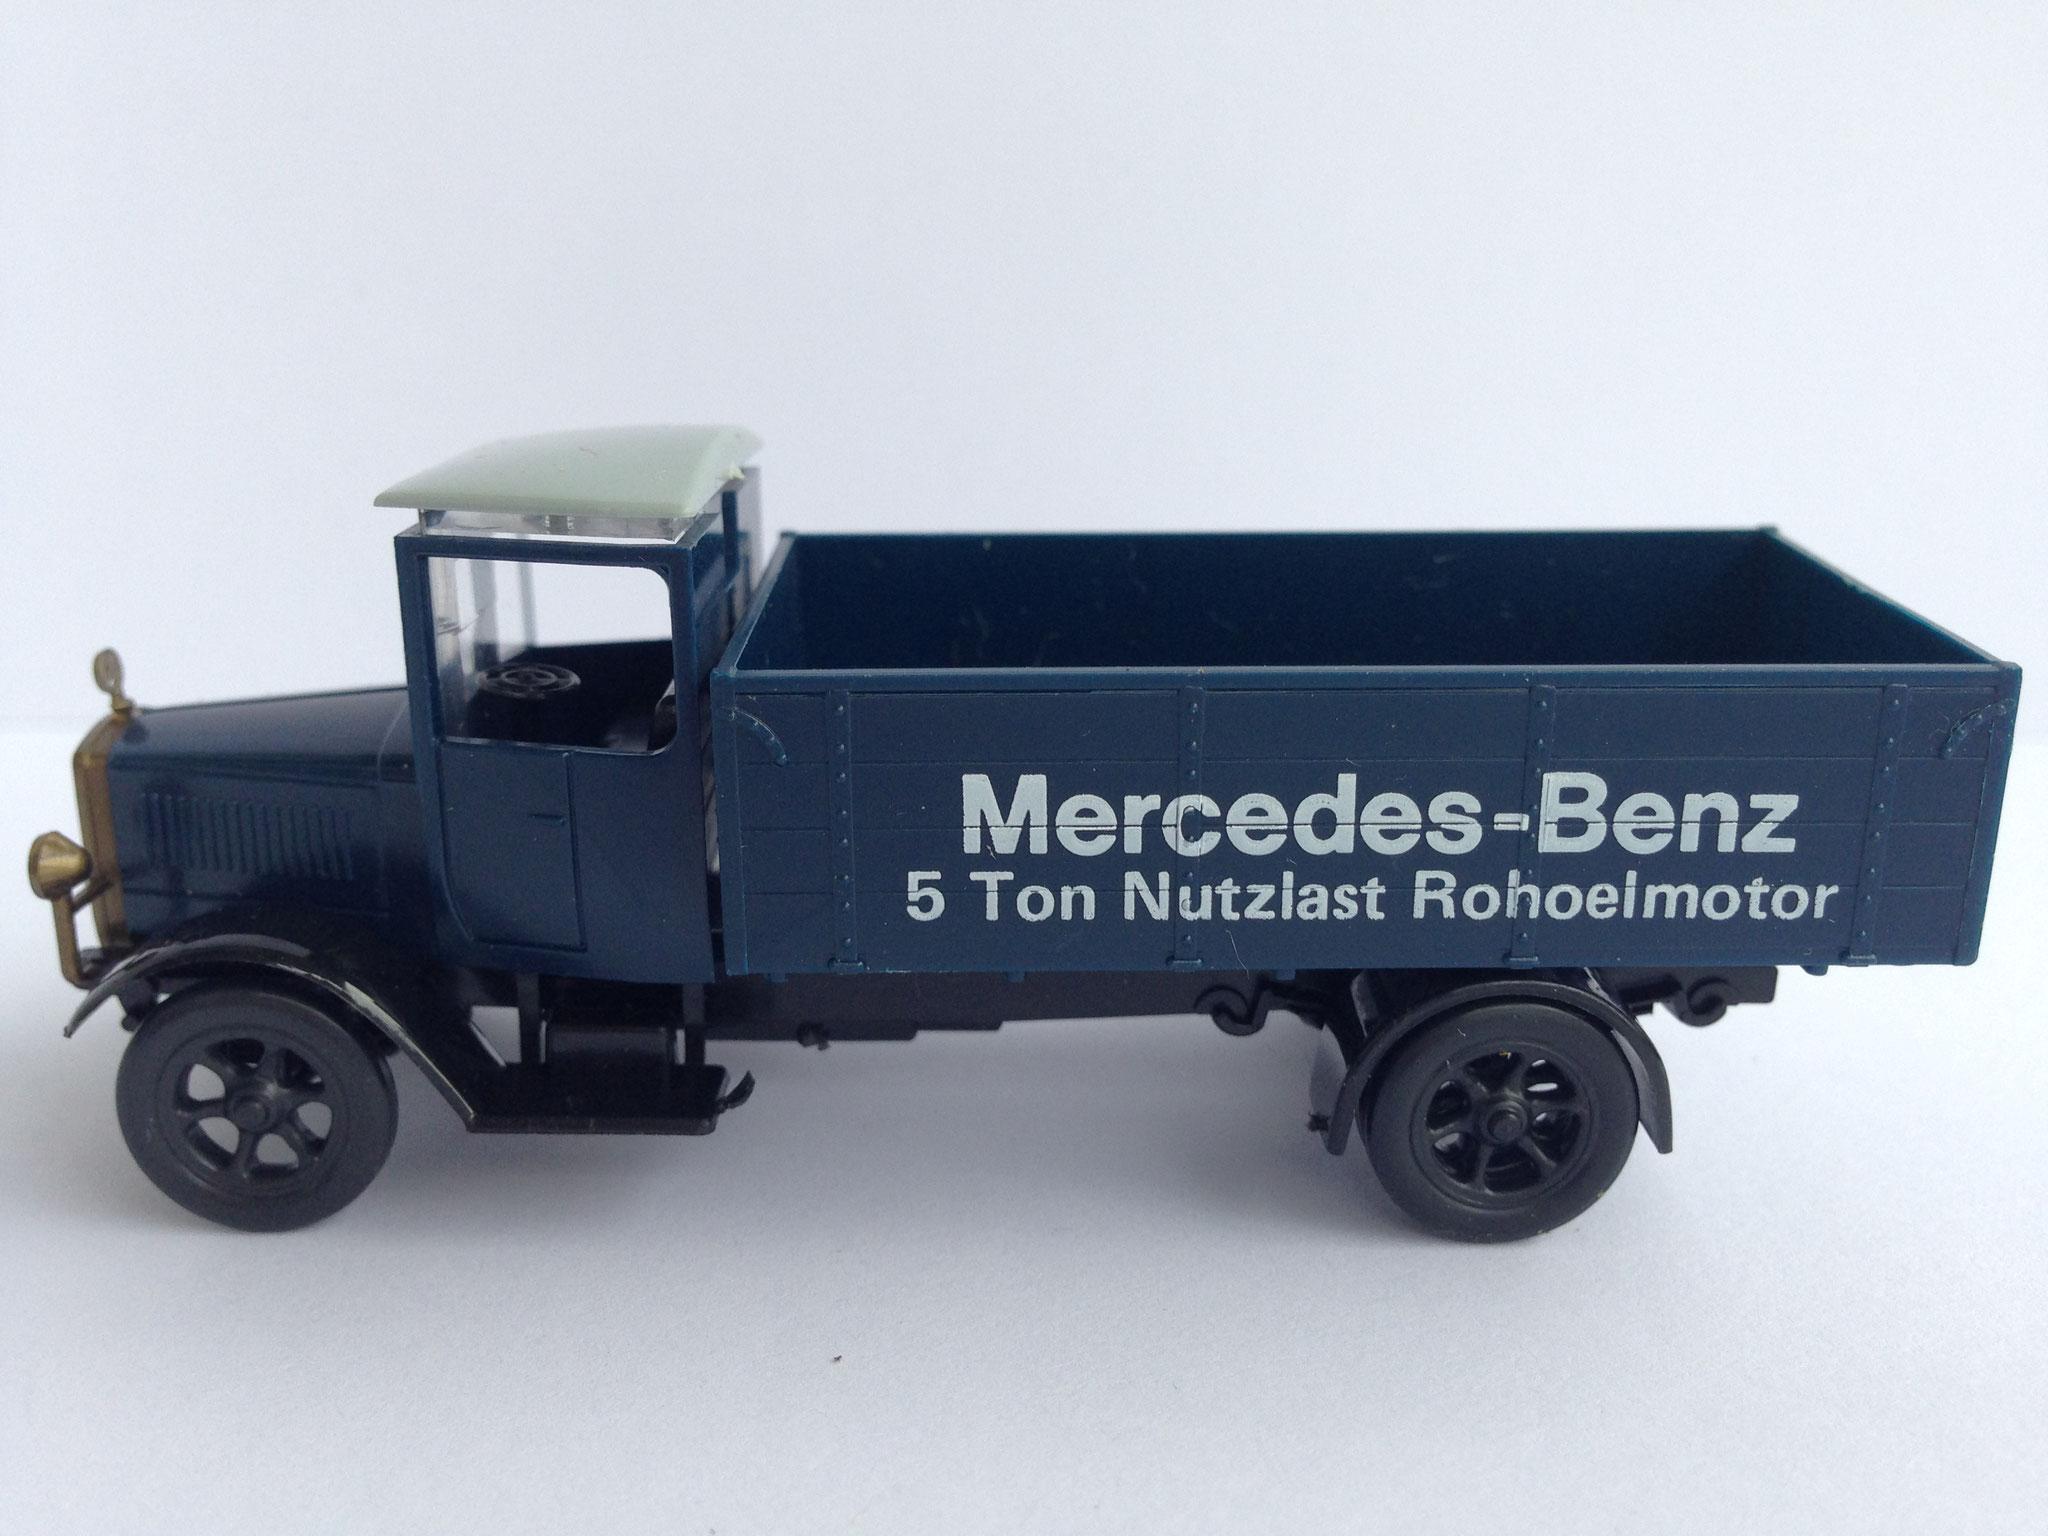 Mercedes L5 Mercedes-Benz 5 Ton Nutzlast Rohoelmotor (MB-Museum)